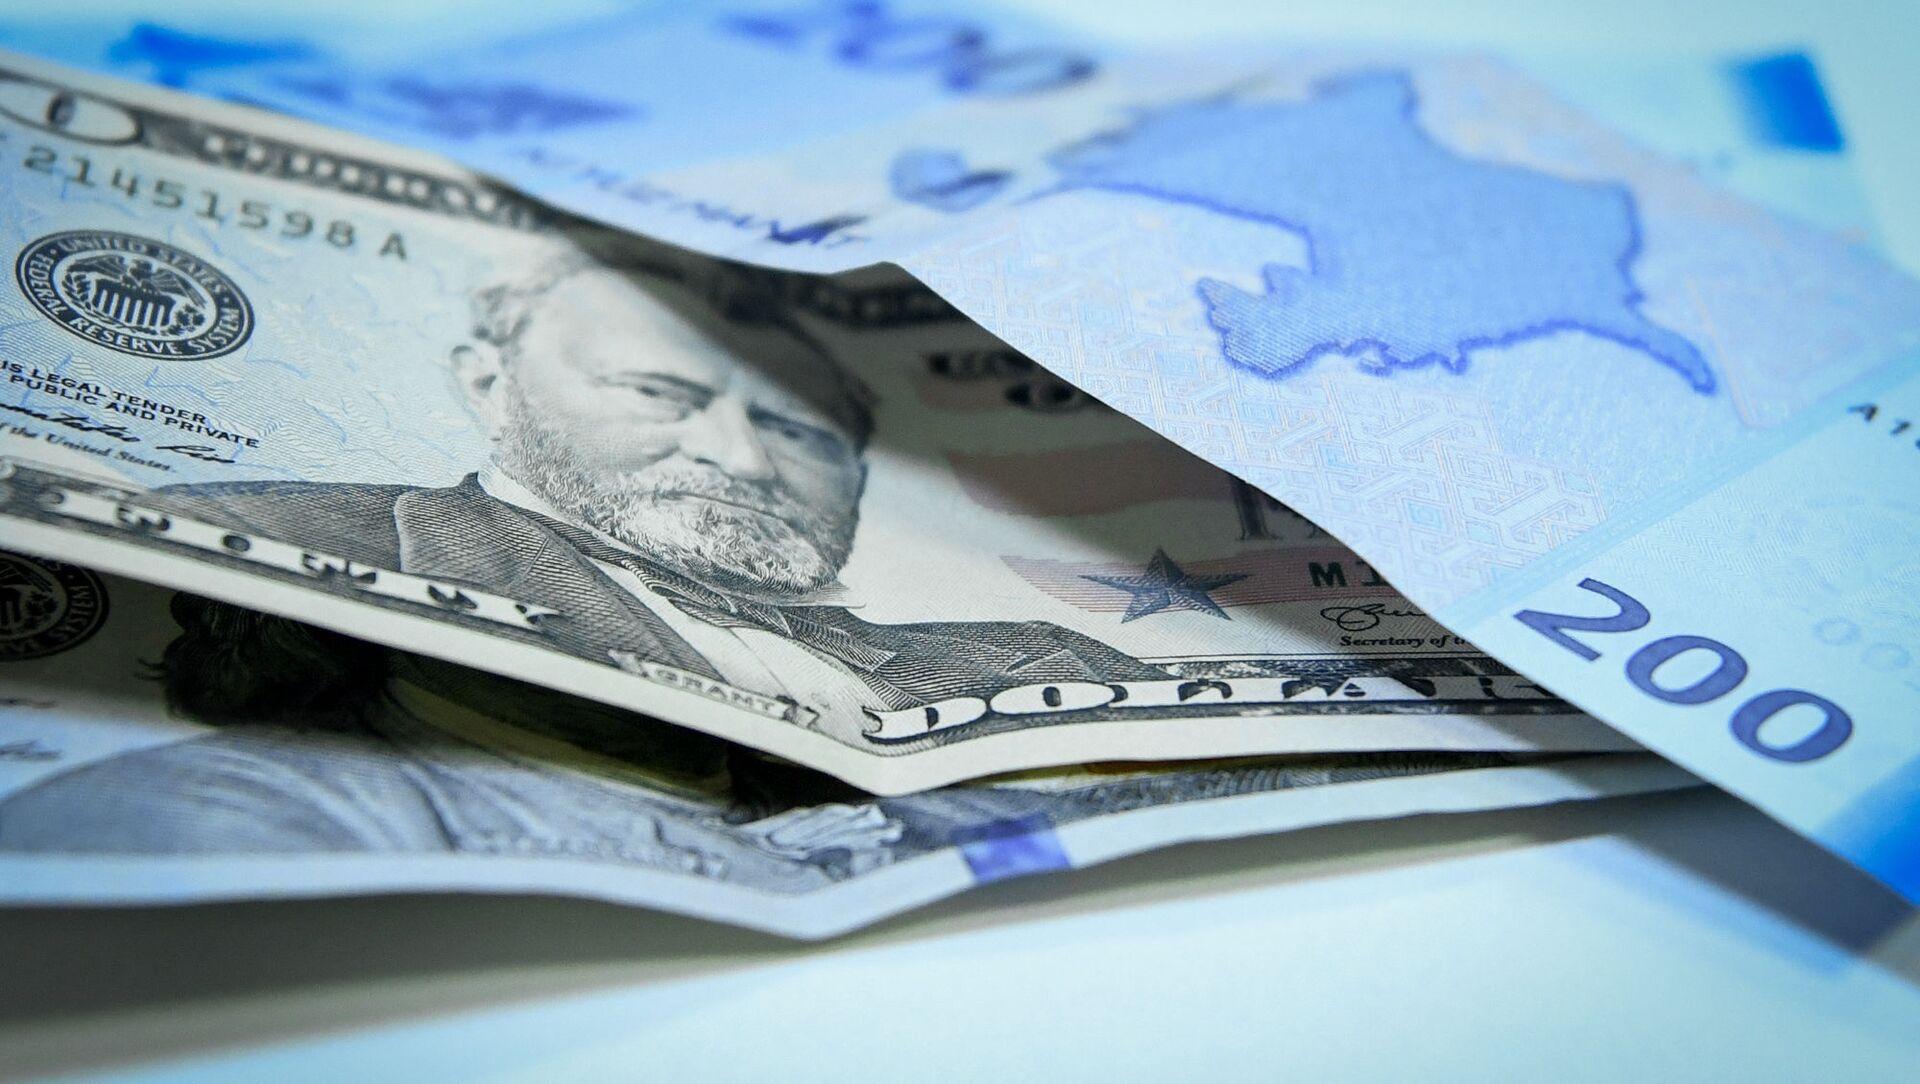 Манат и доллары, фото из архива - Sputnik Azərbaycan, 1920, 13.07.2021